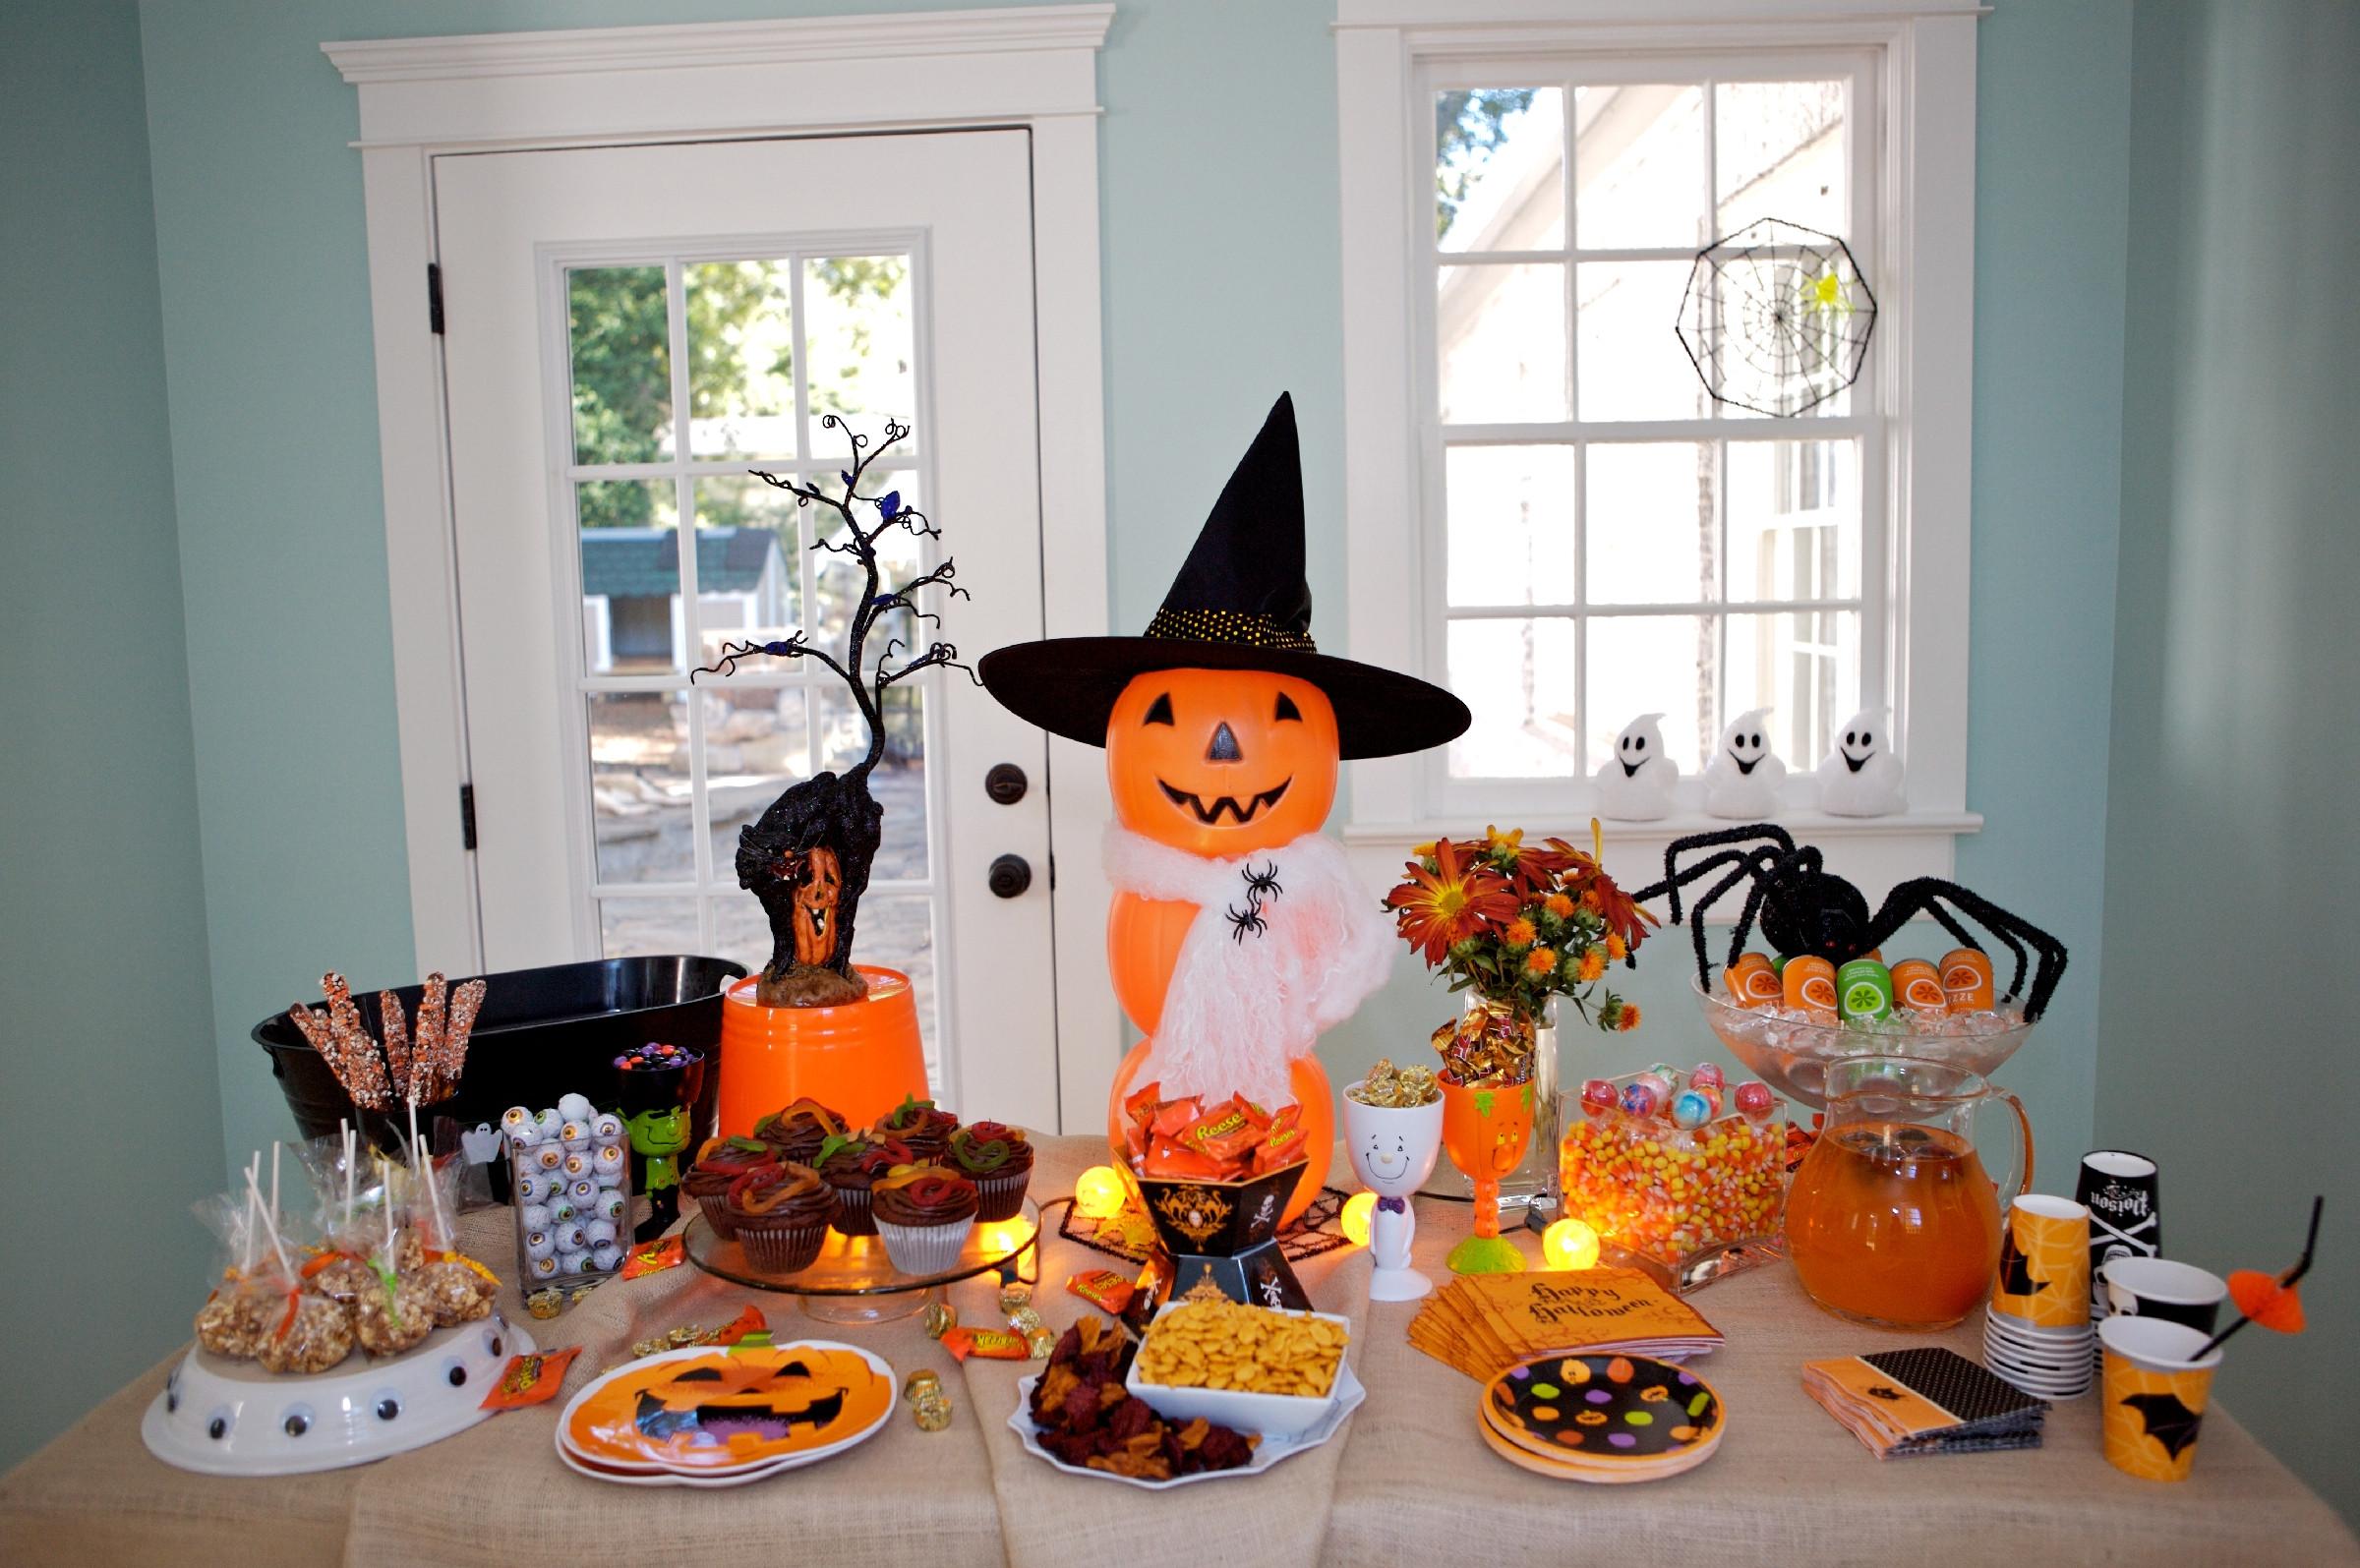 Ideas Halloween Party  Martie Knows Parties BLOG Host a Neighborhood